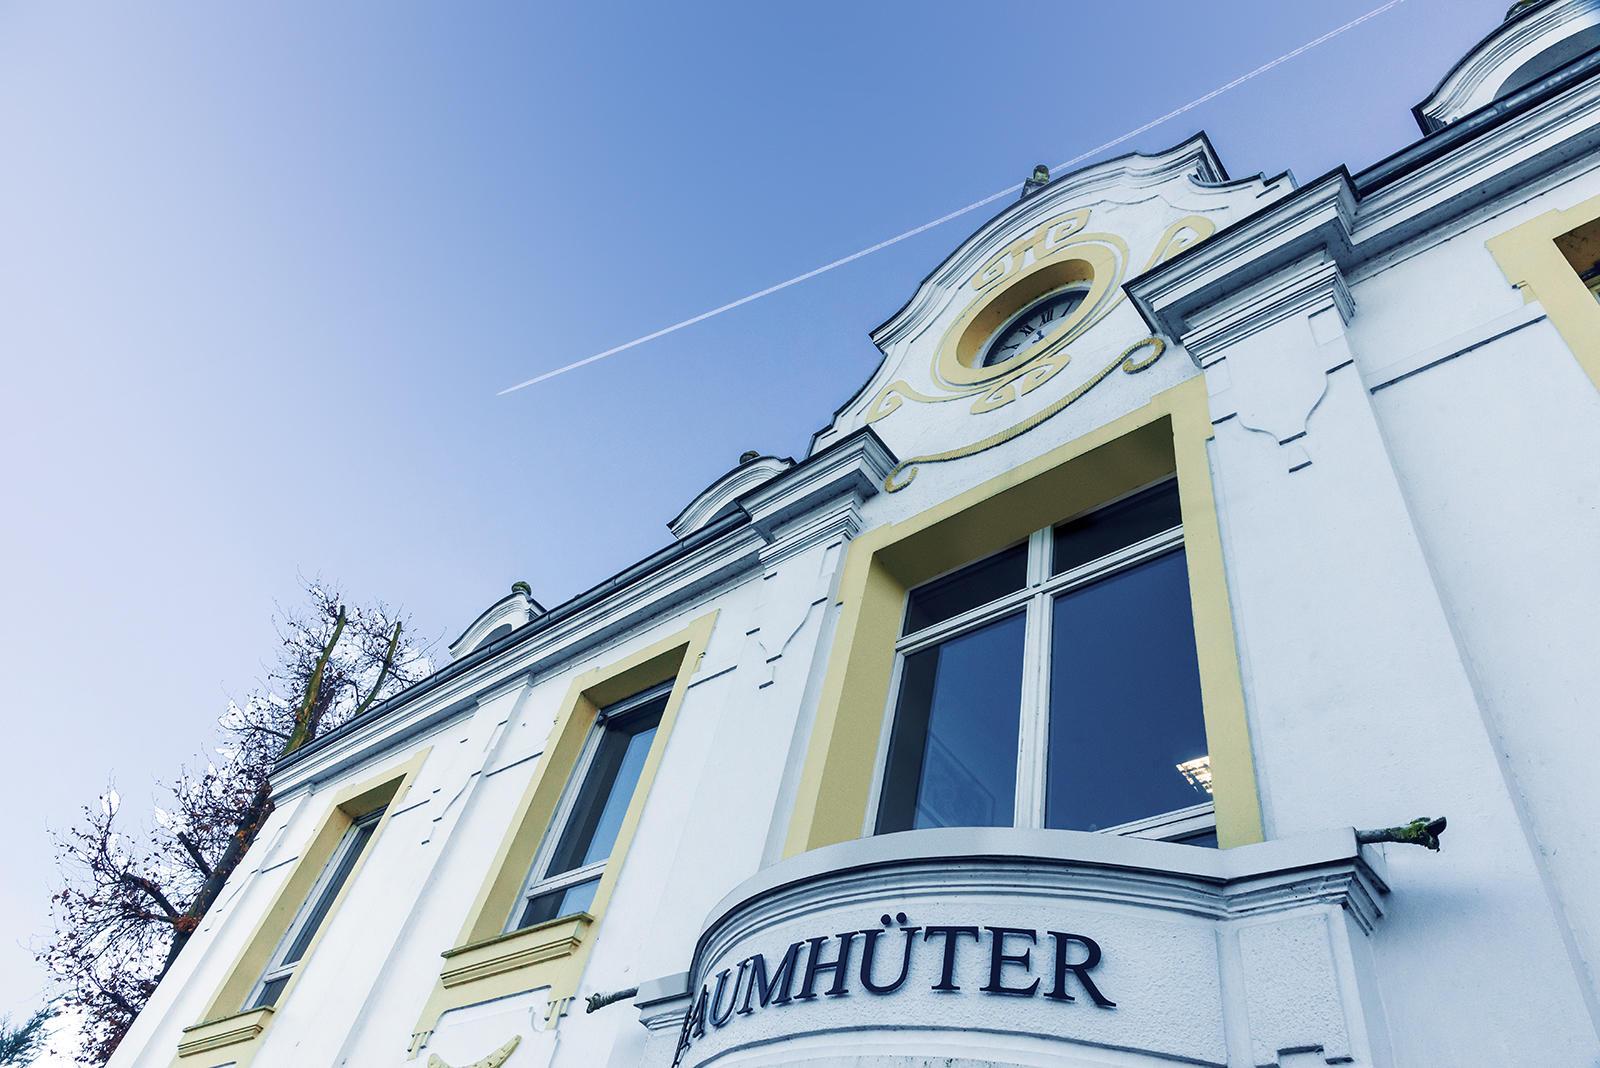 baumhueter rheda wiedenbrück